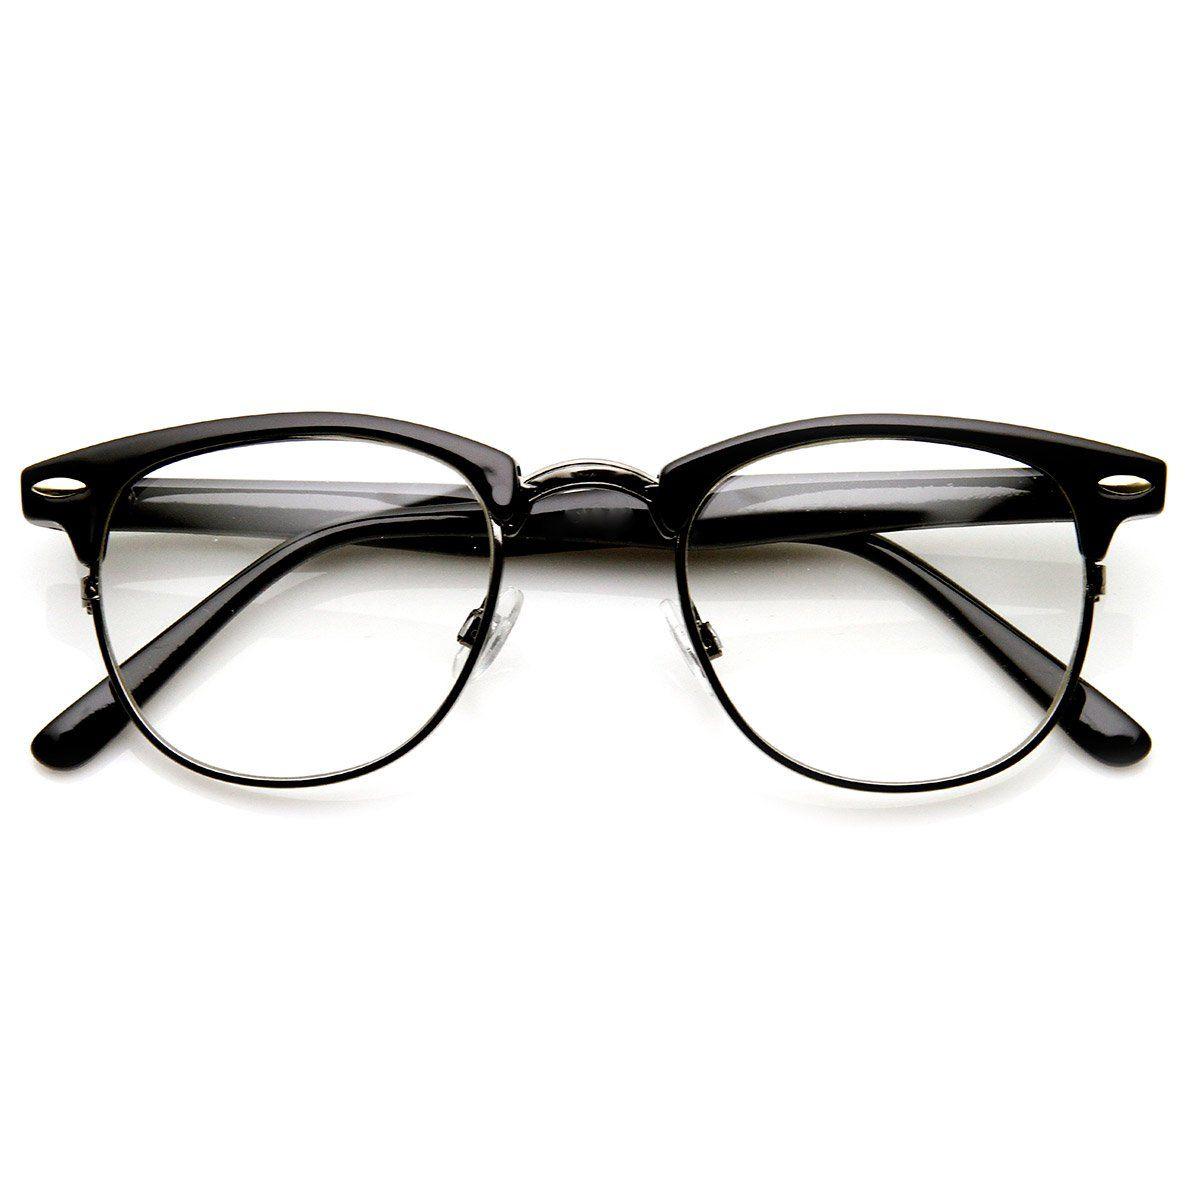 c5538b861d Vintage Half Frame Semi-Rimless Horn Rimmed Style Classic Optical RX  Sunglasses